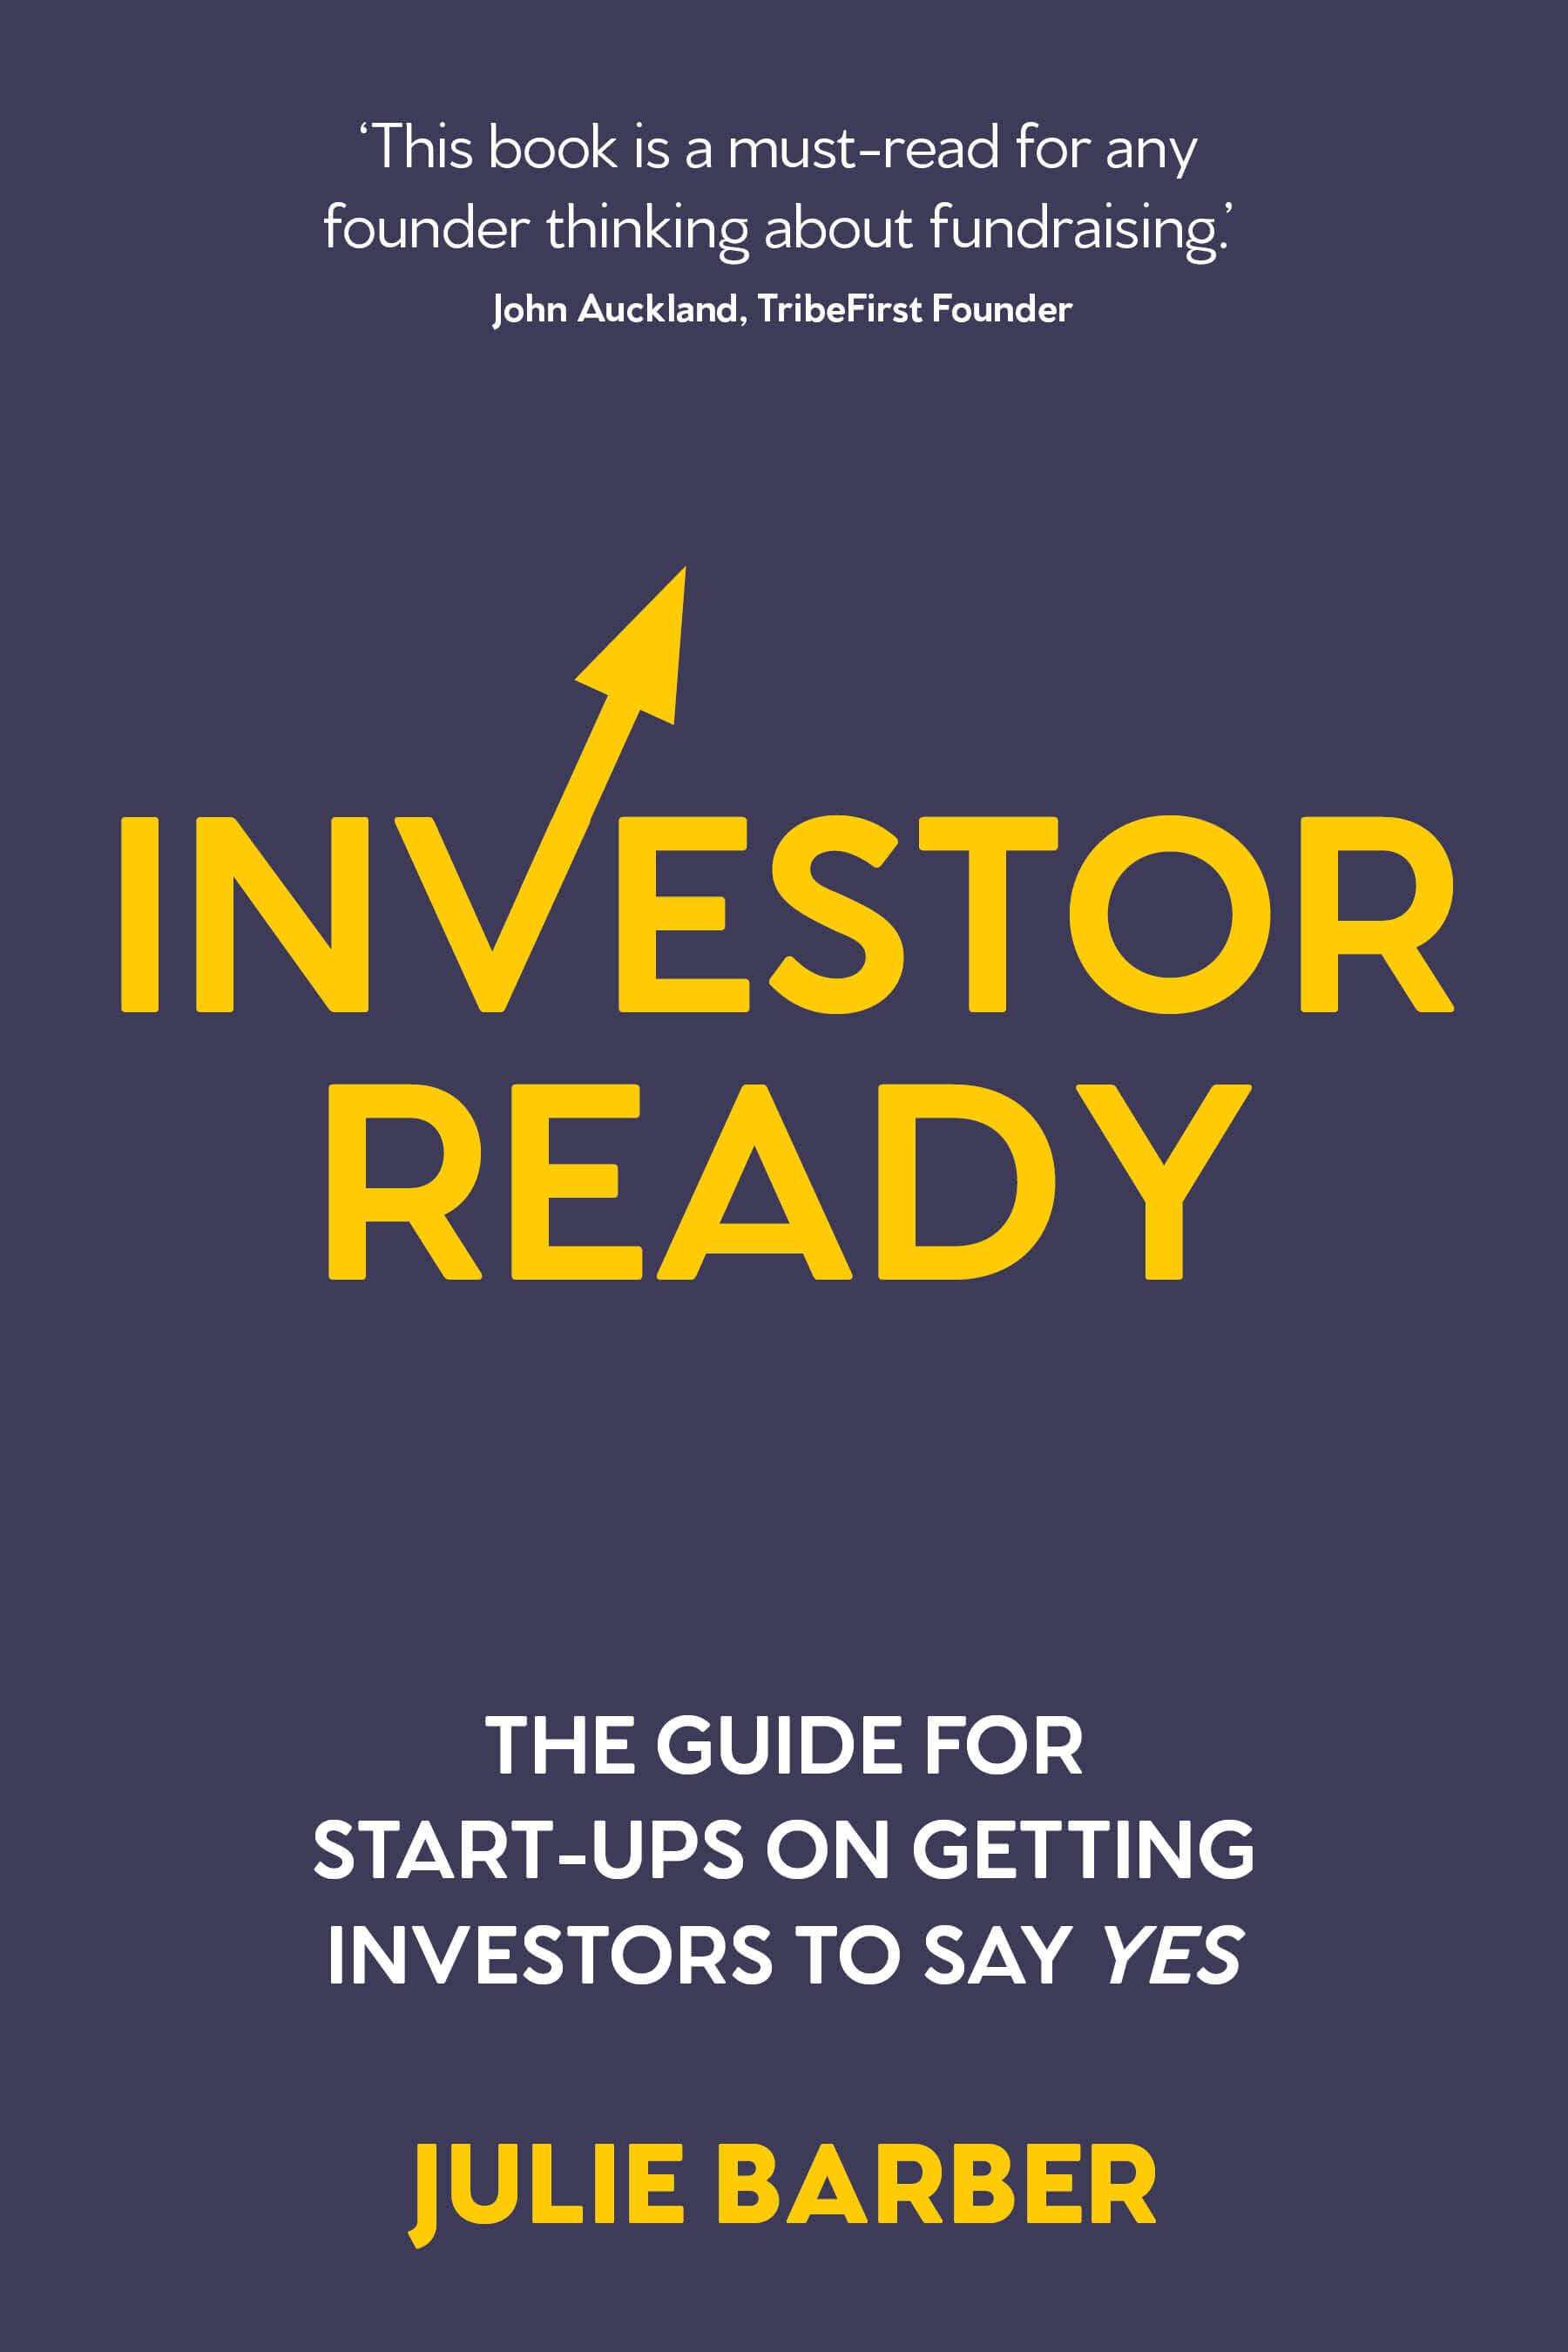 investor-ready-book-cover